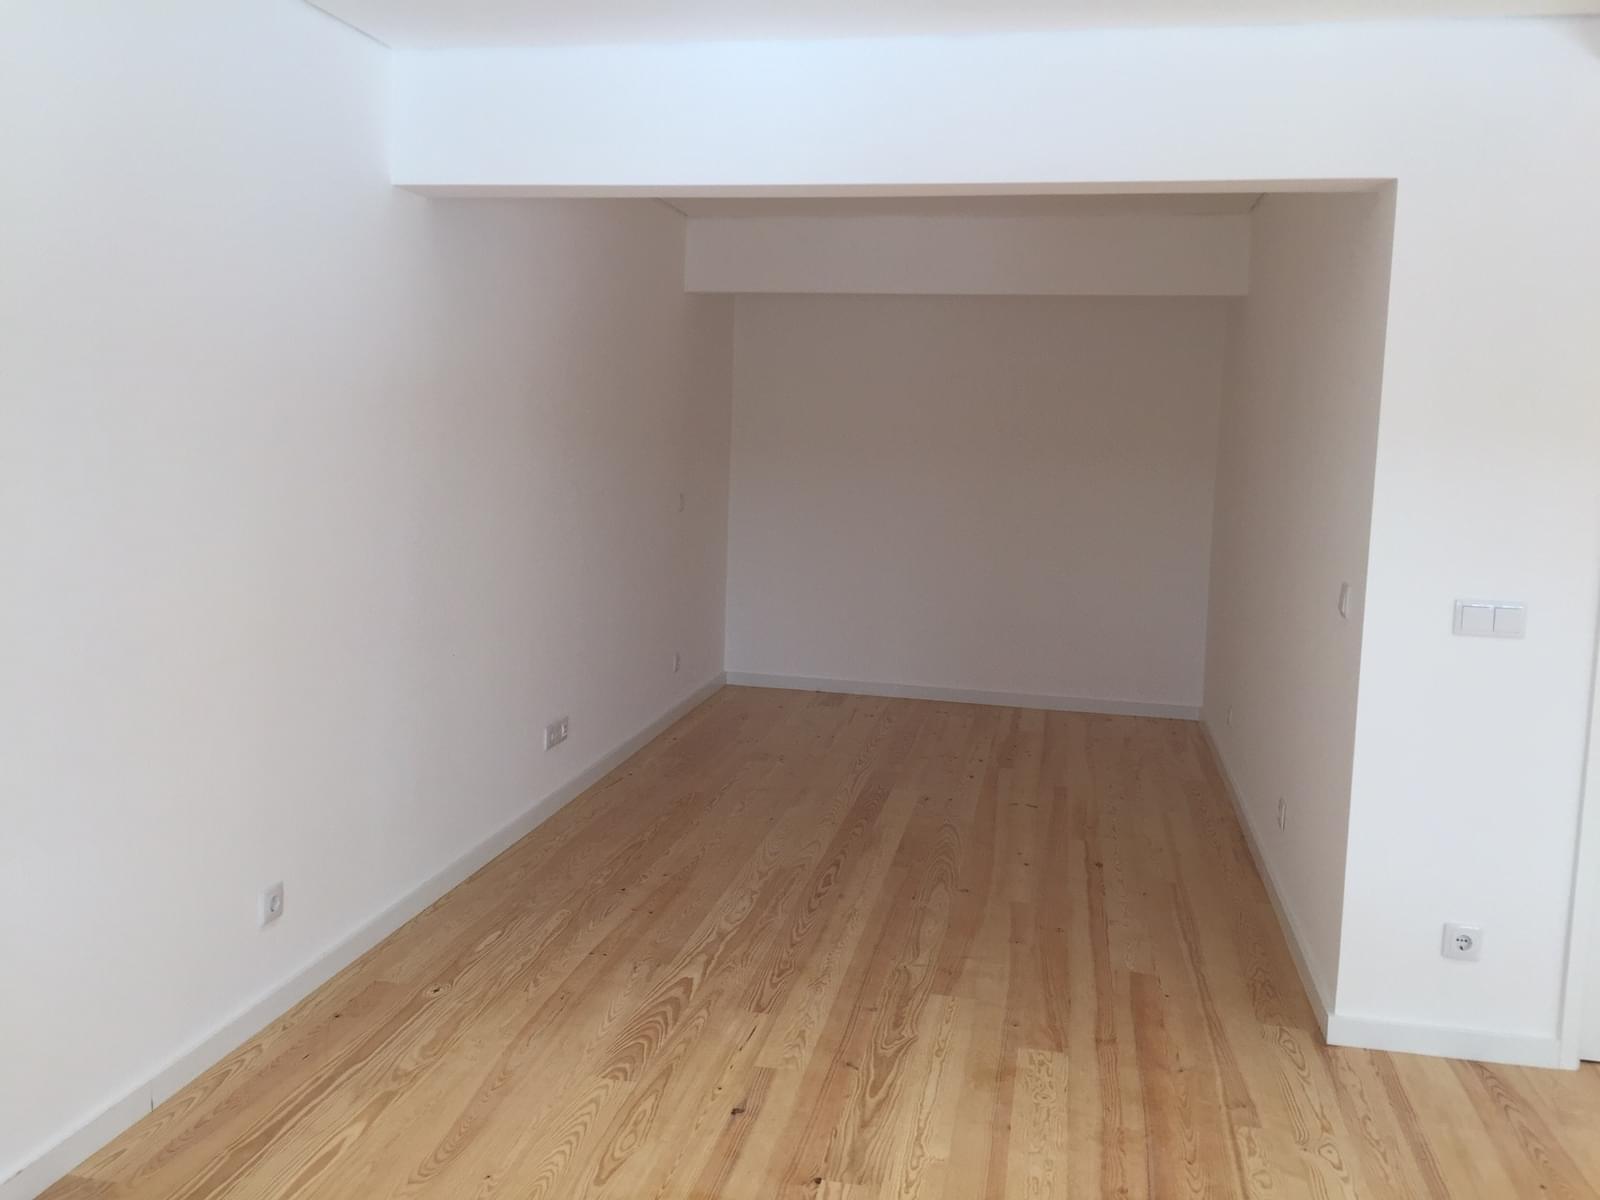 pf18802-apartamento-t1-lisboa-9096ad3d-9ad9-4fd4-8e4b-dcb4ae4a6392